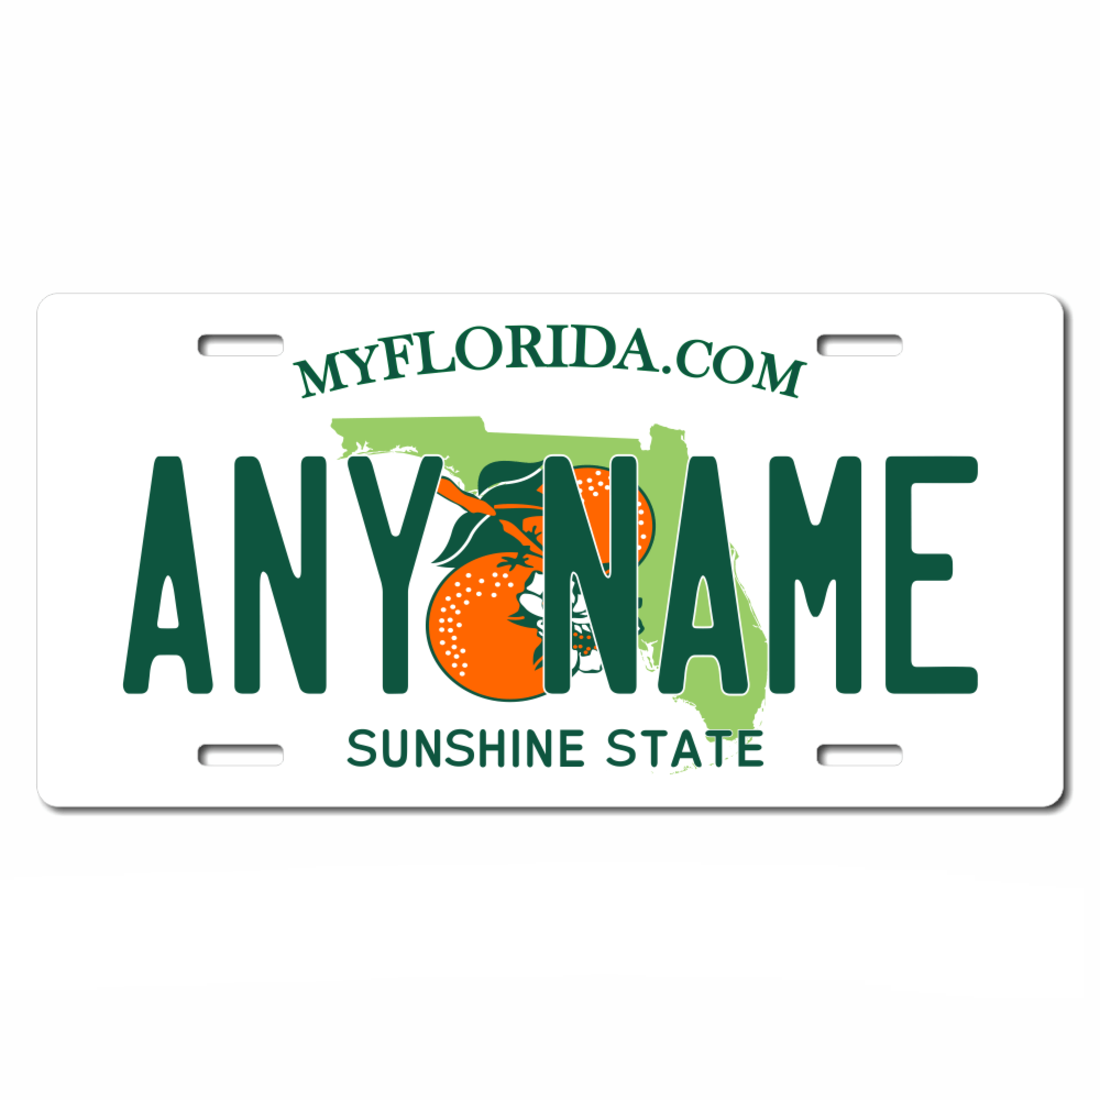 Florida is beautiful License Plate Creare Visual Design